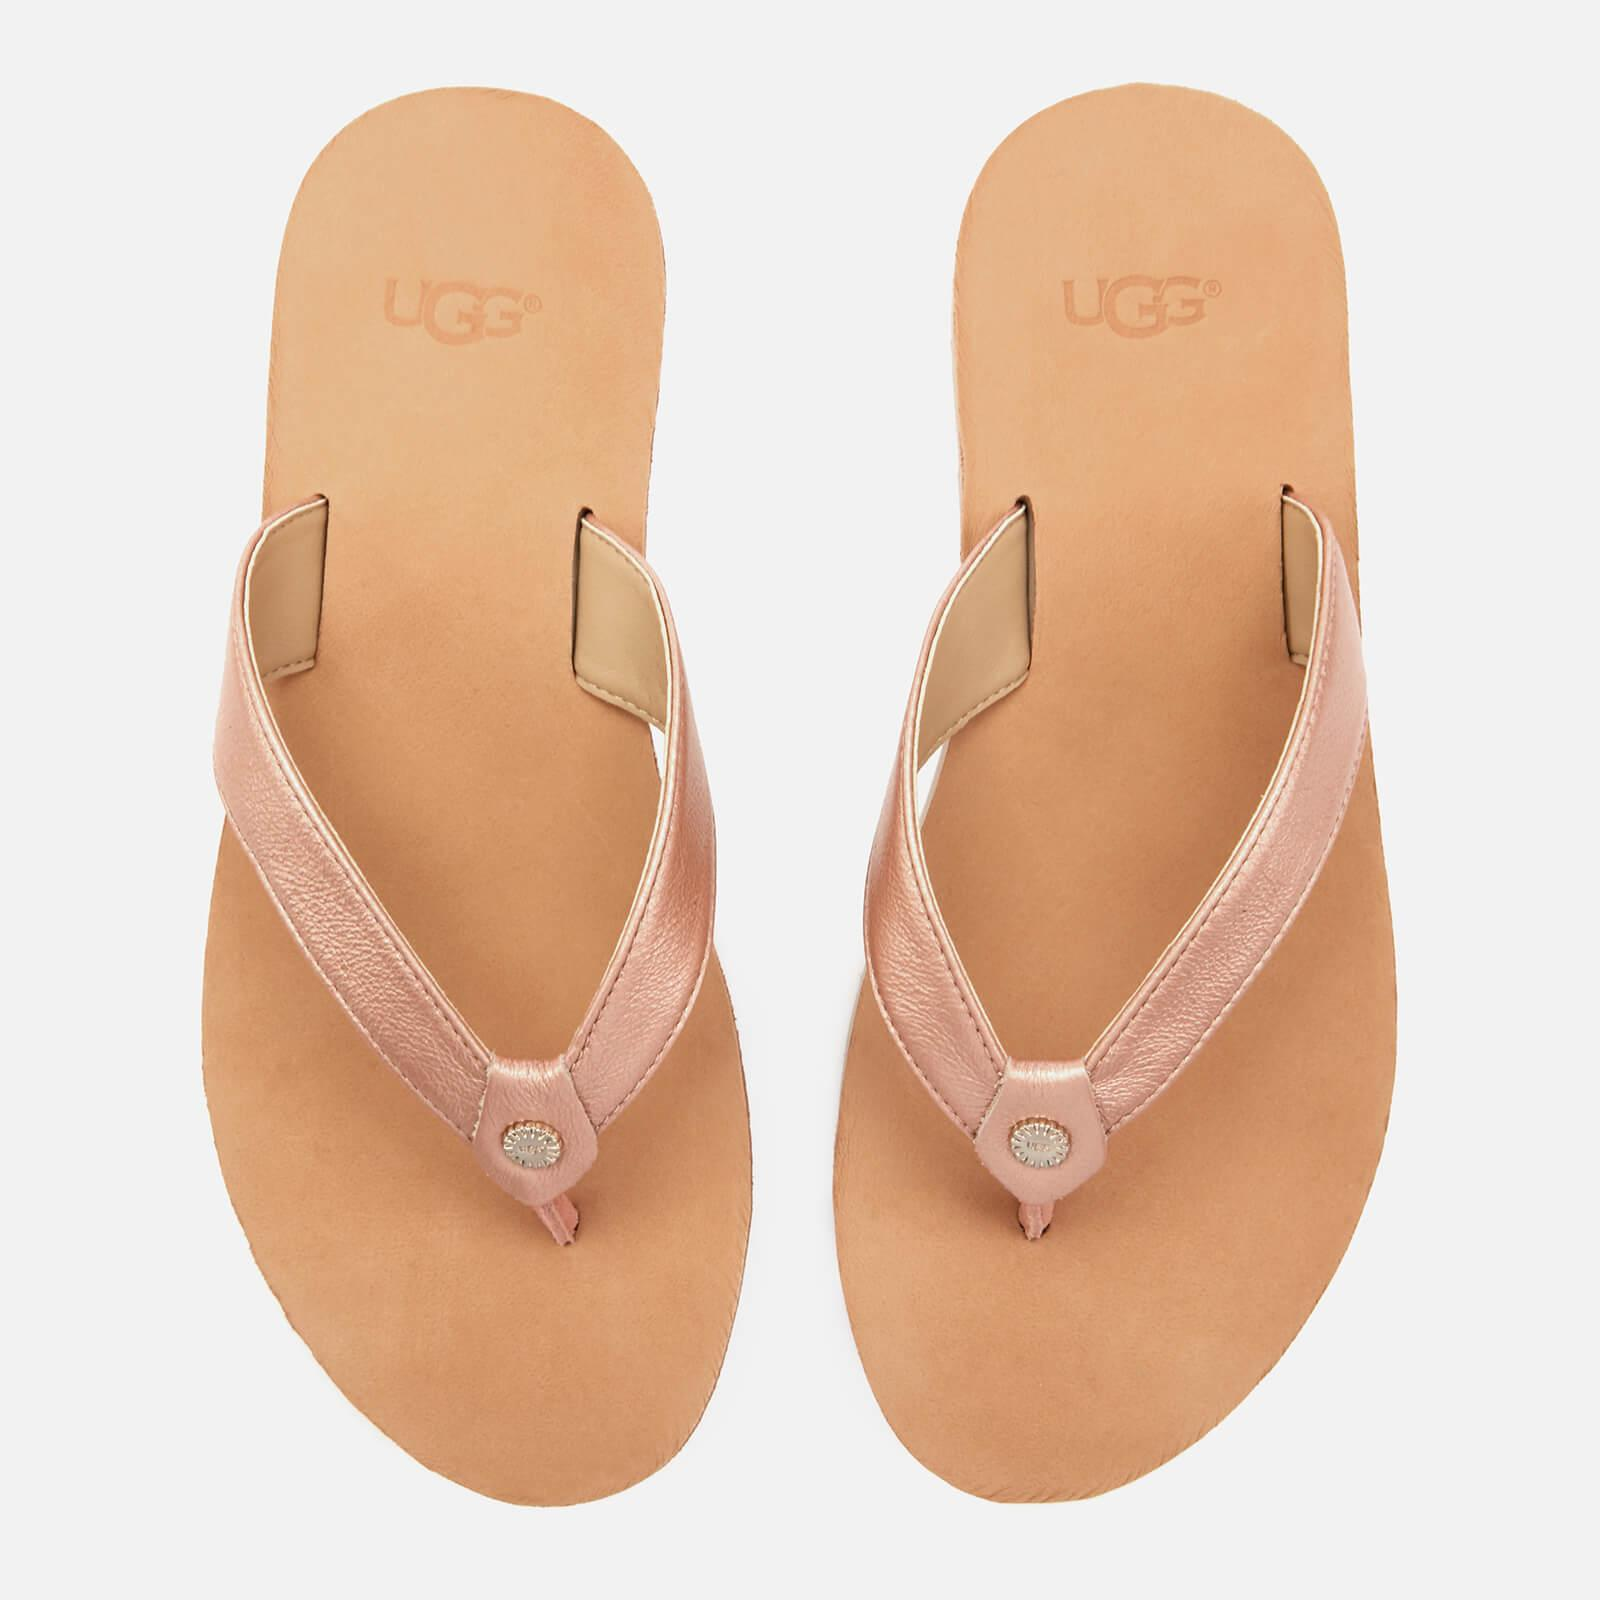 393c101ad24 Women's Pink Tawney Metallic Flip Flops